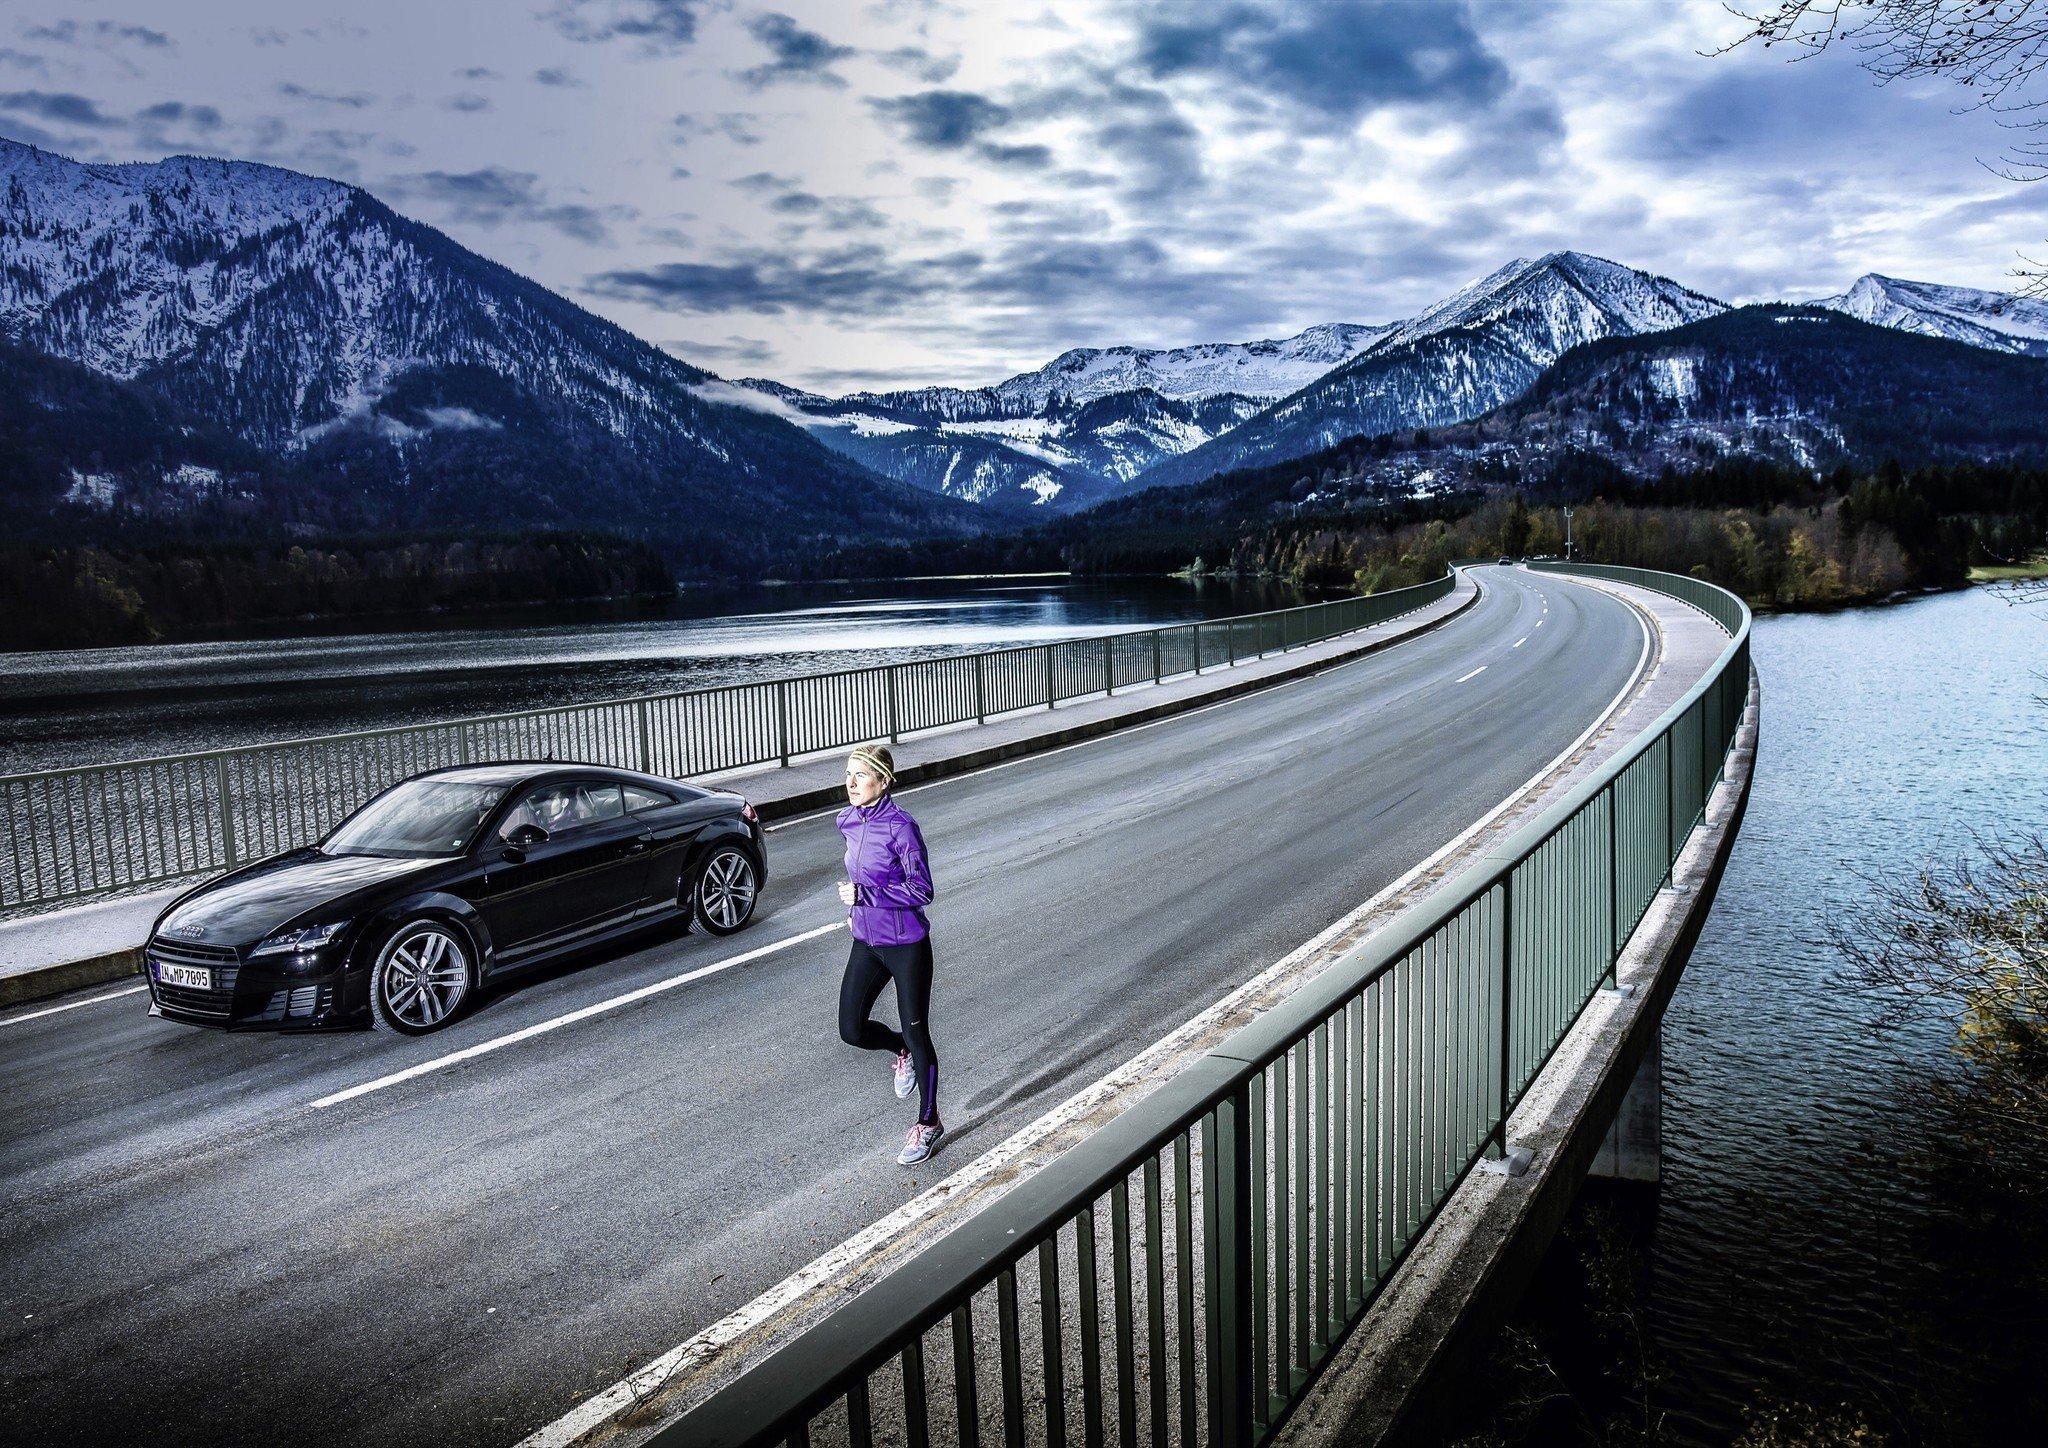 Audi fit driver